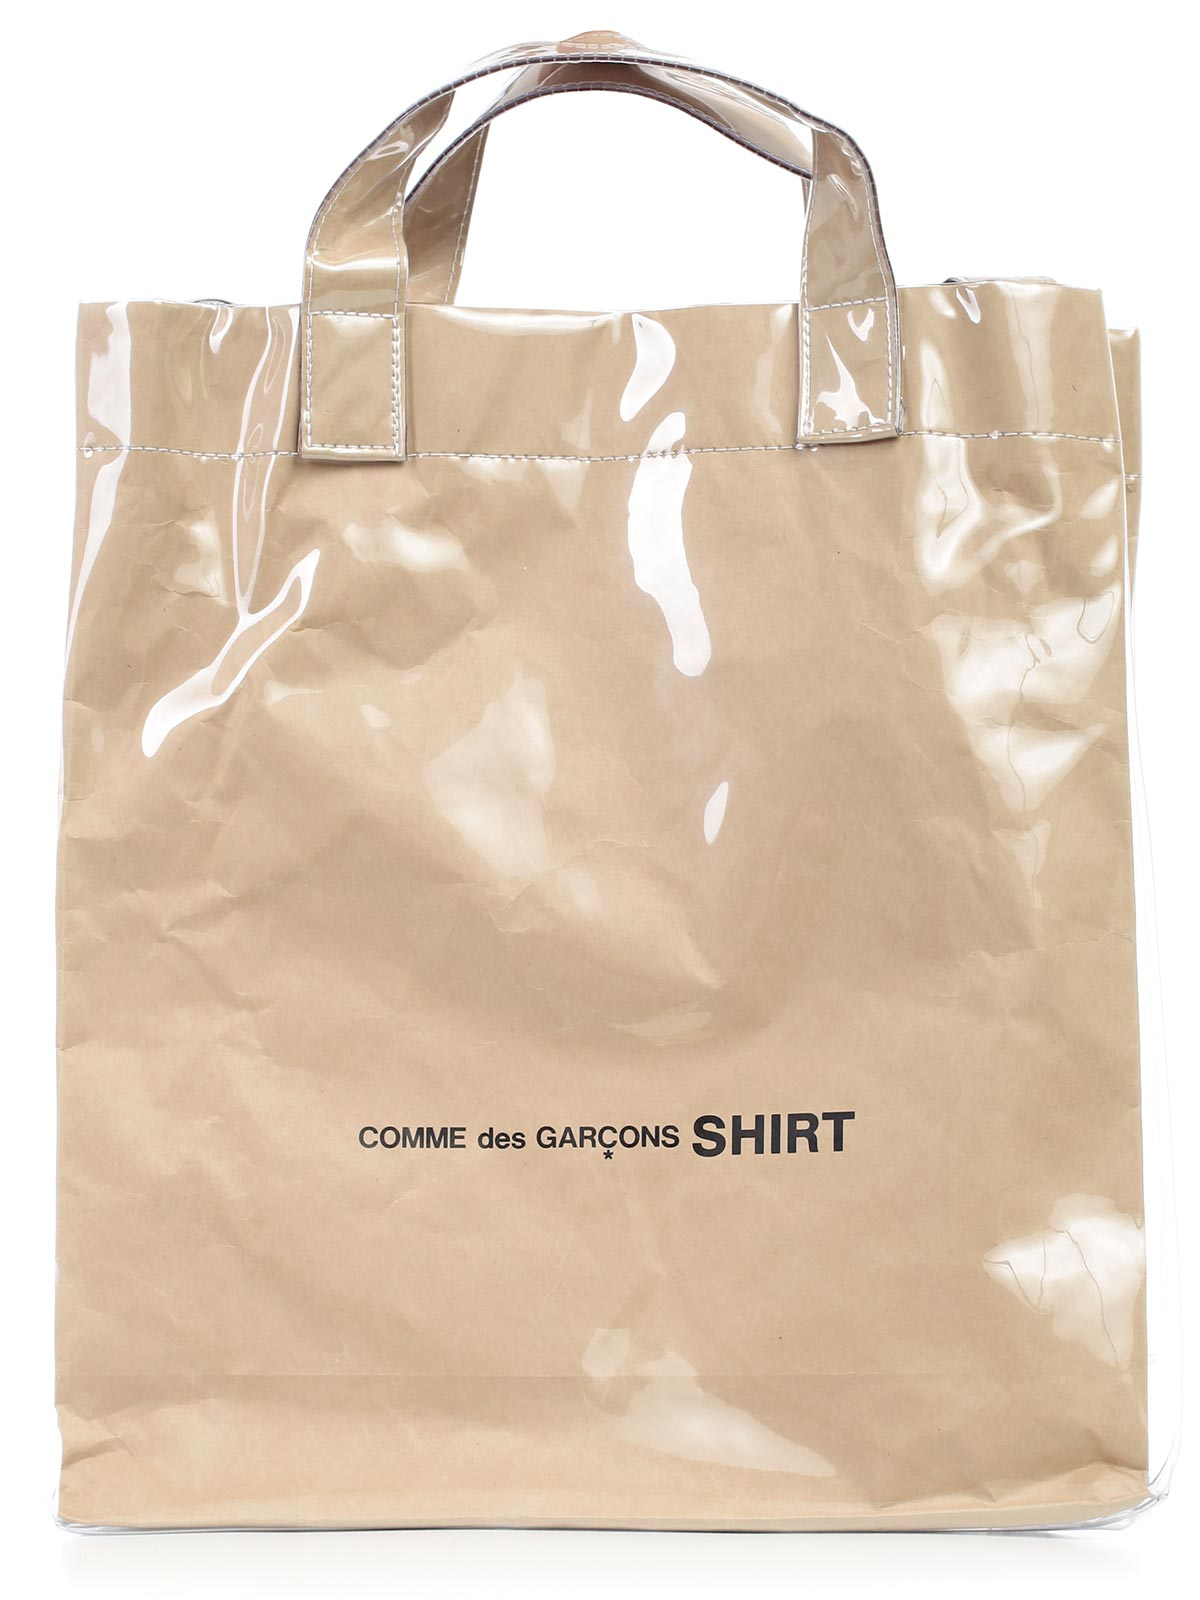 Picture of Comme Des Garcons Shirt Totes